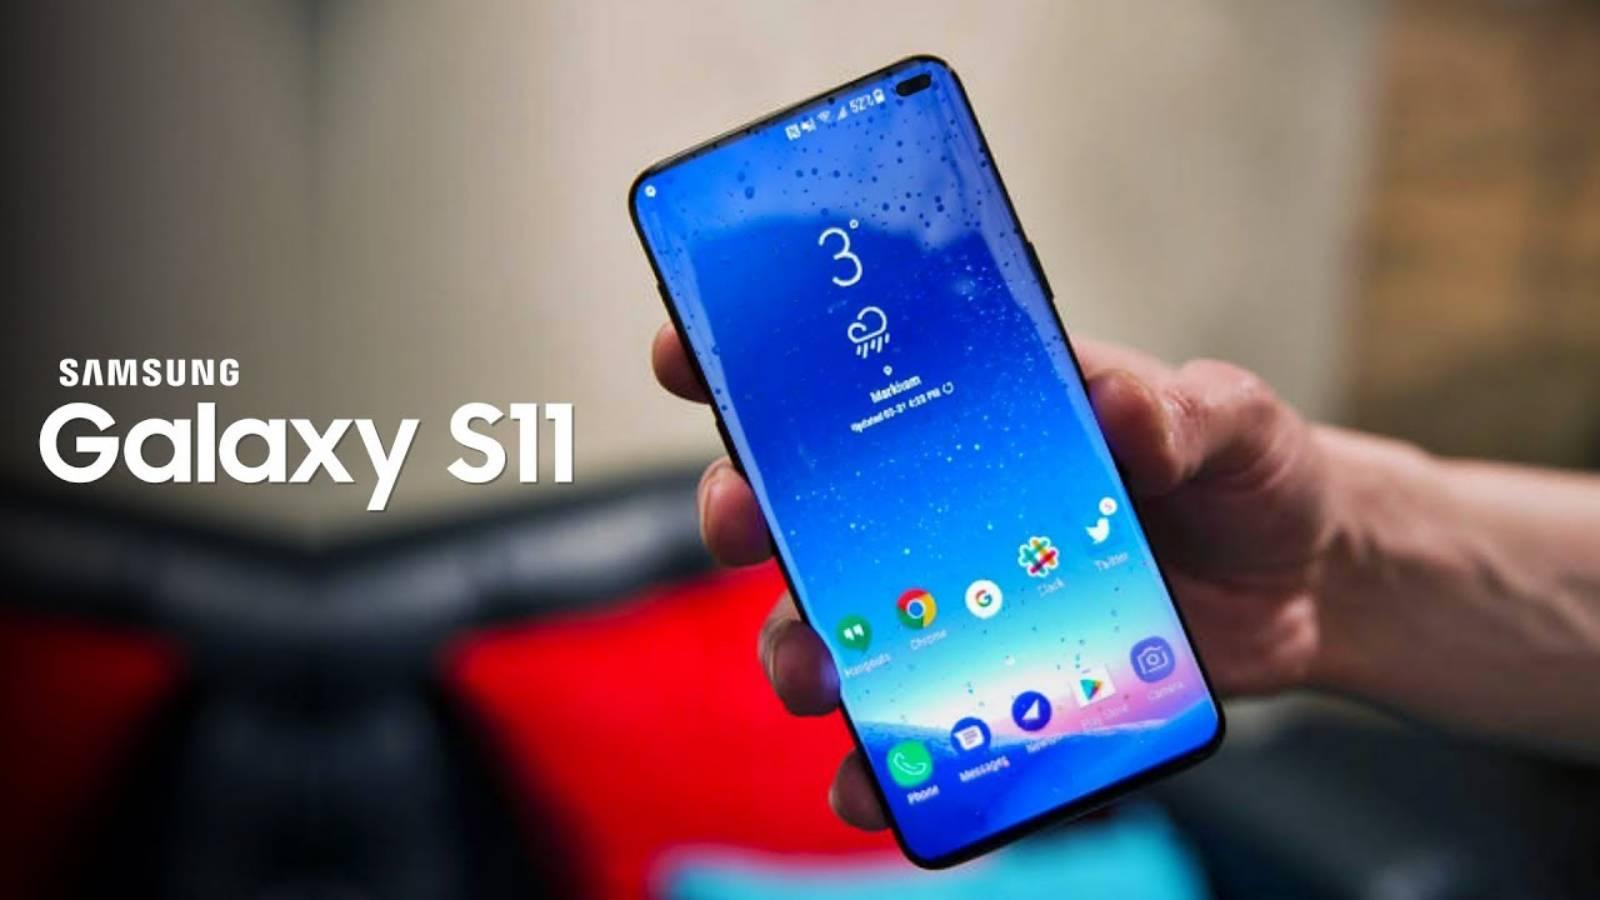 Samsung Galaxy S11 to include 108 MP Camera Sensor